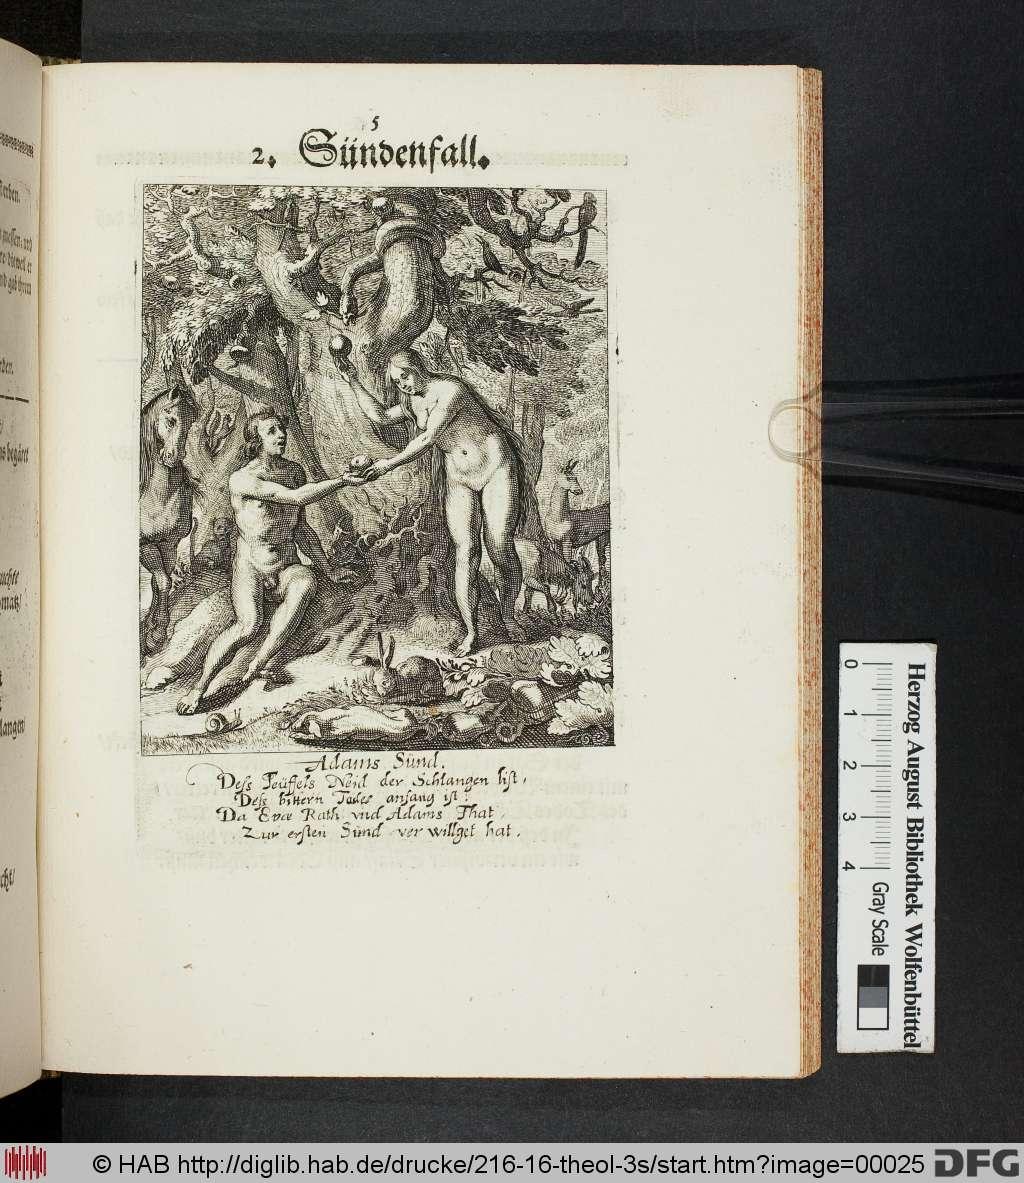 http://diglib.hab.de/drucke/216-16-theol-3s/00025.jpg